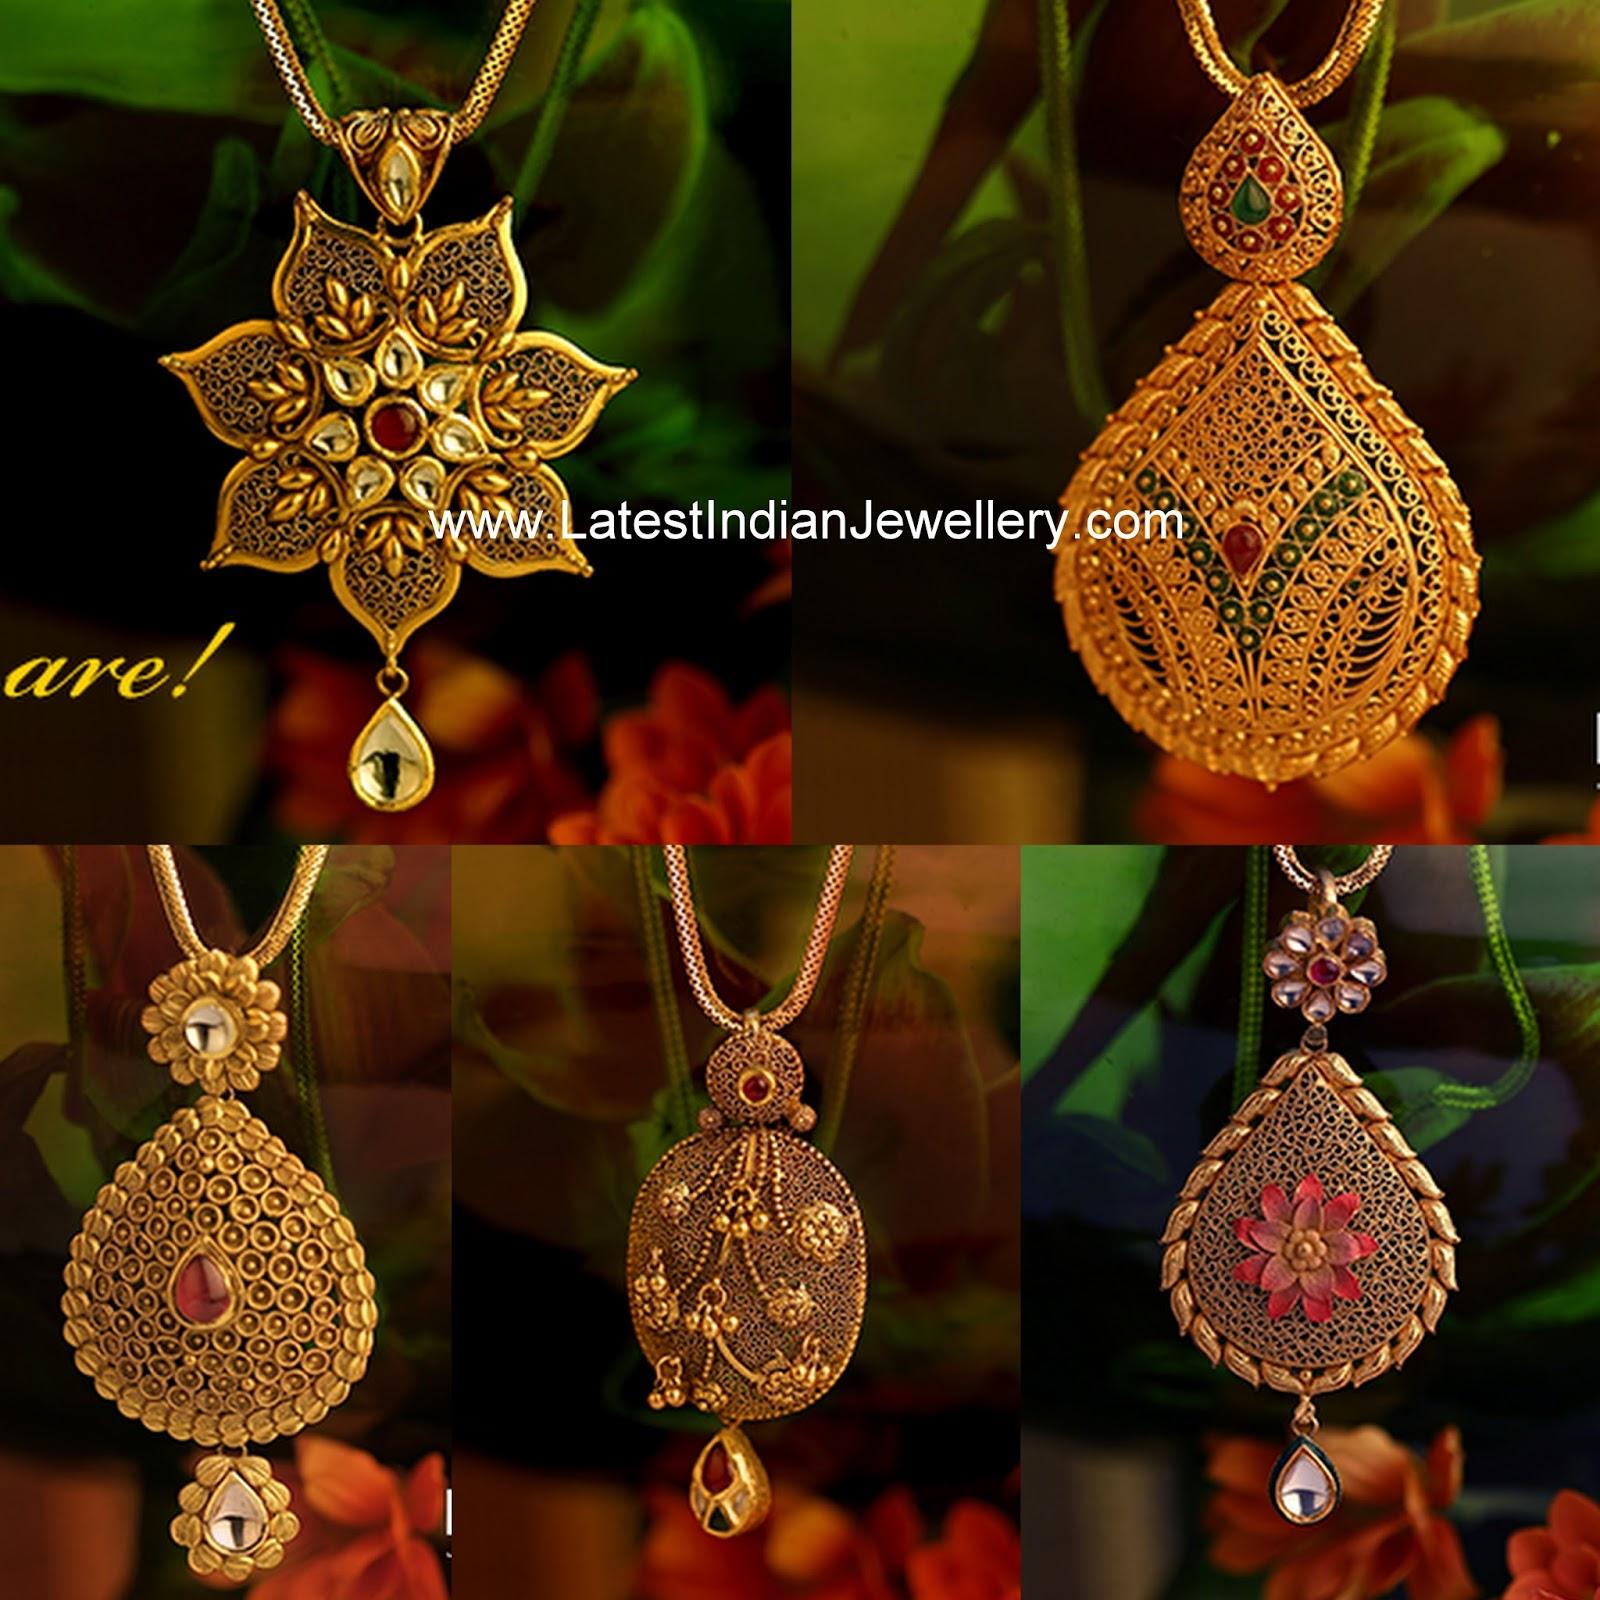 Latest Gold Pendants From Kalyan Latest Indian Jewellery